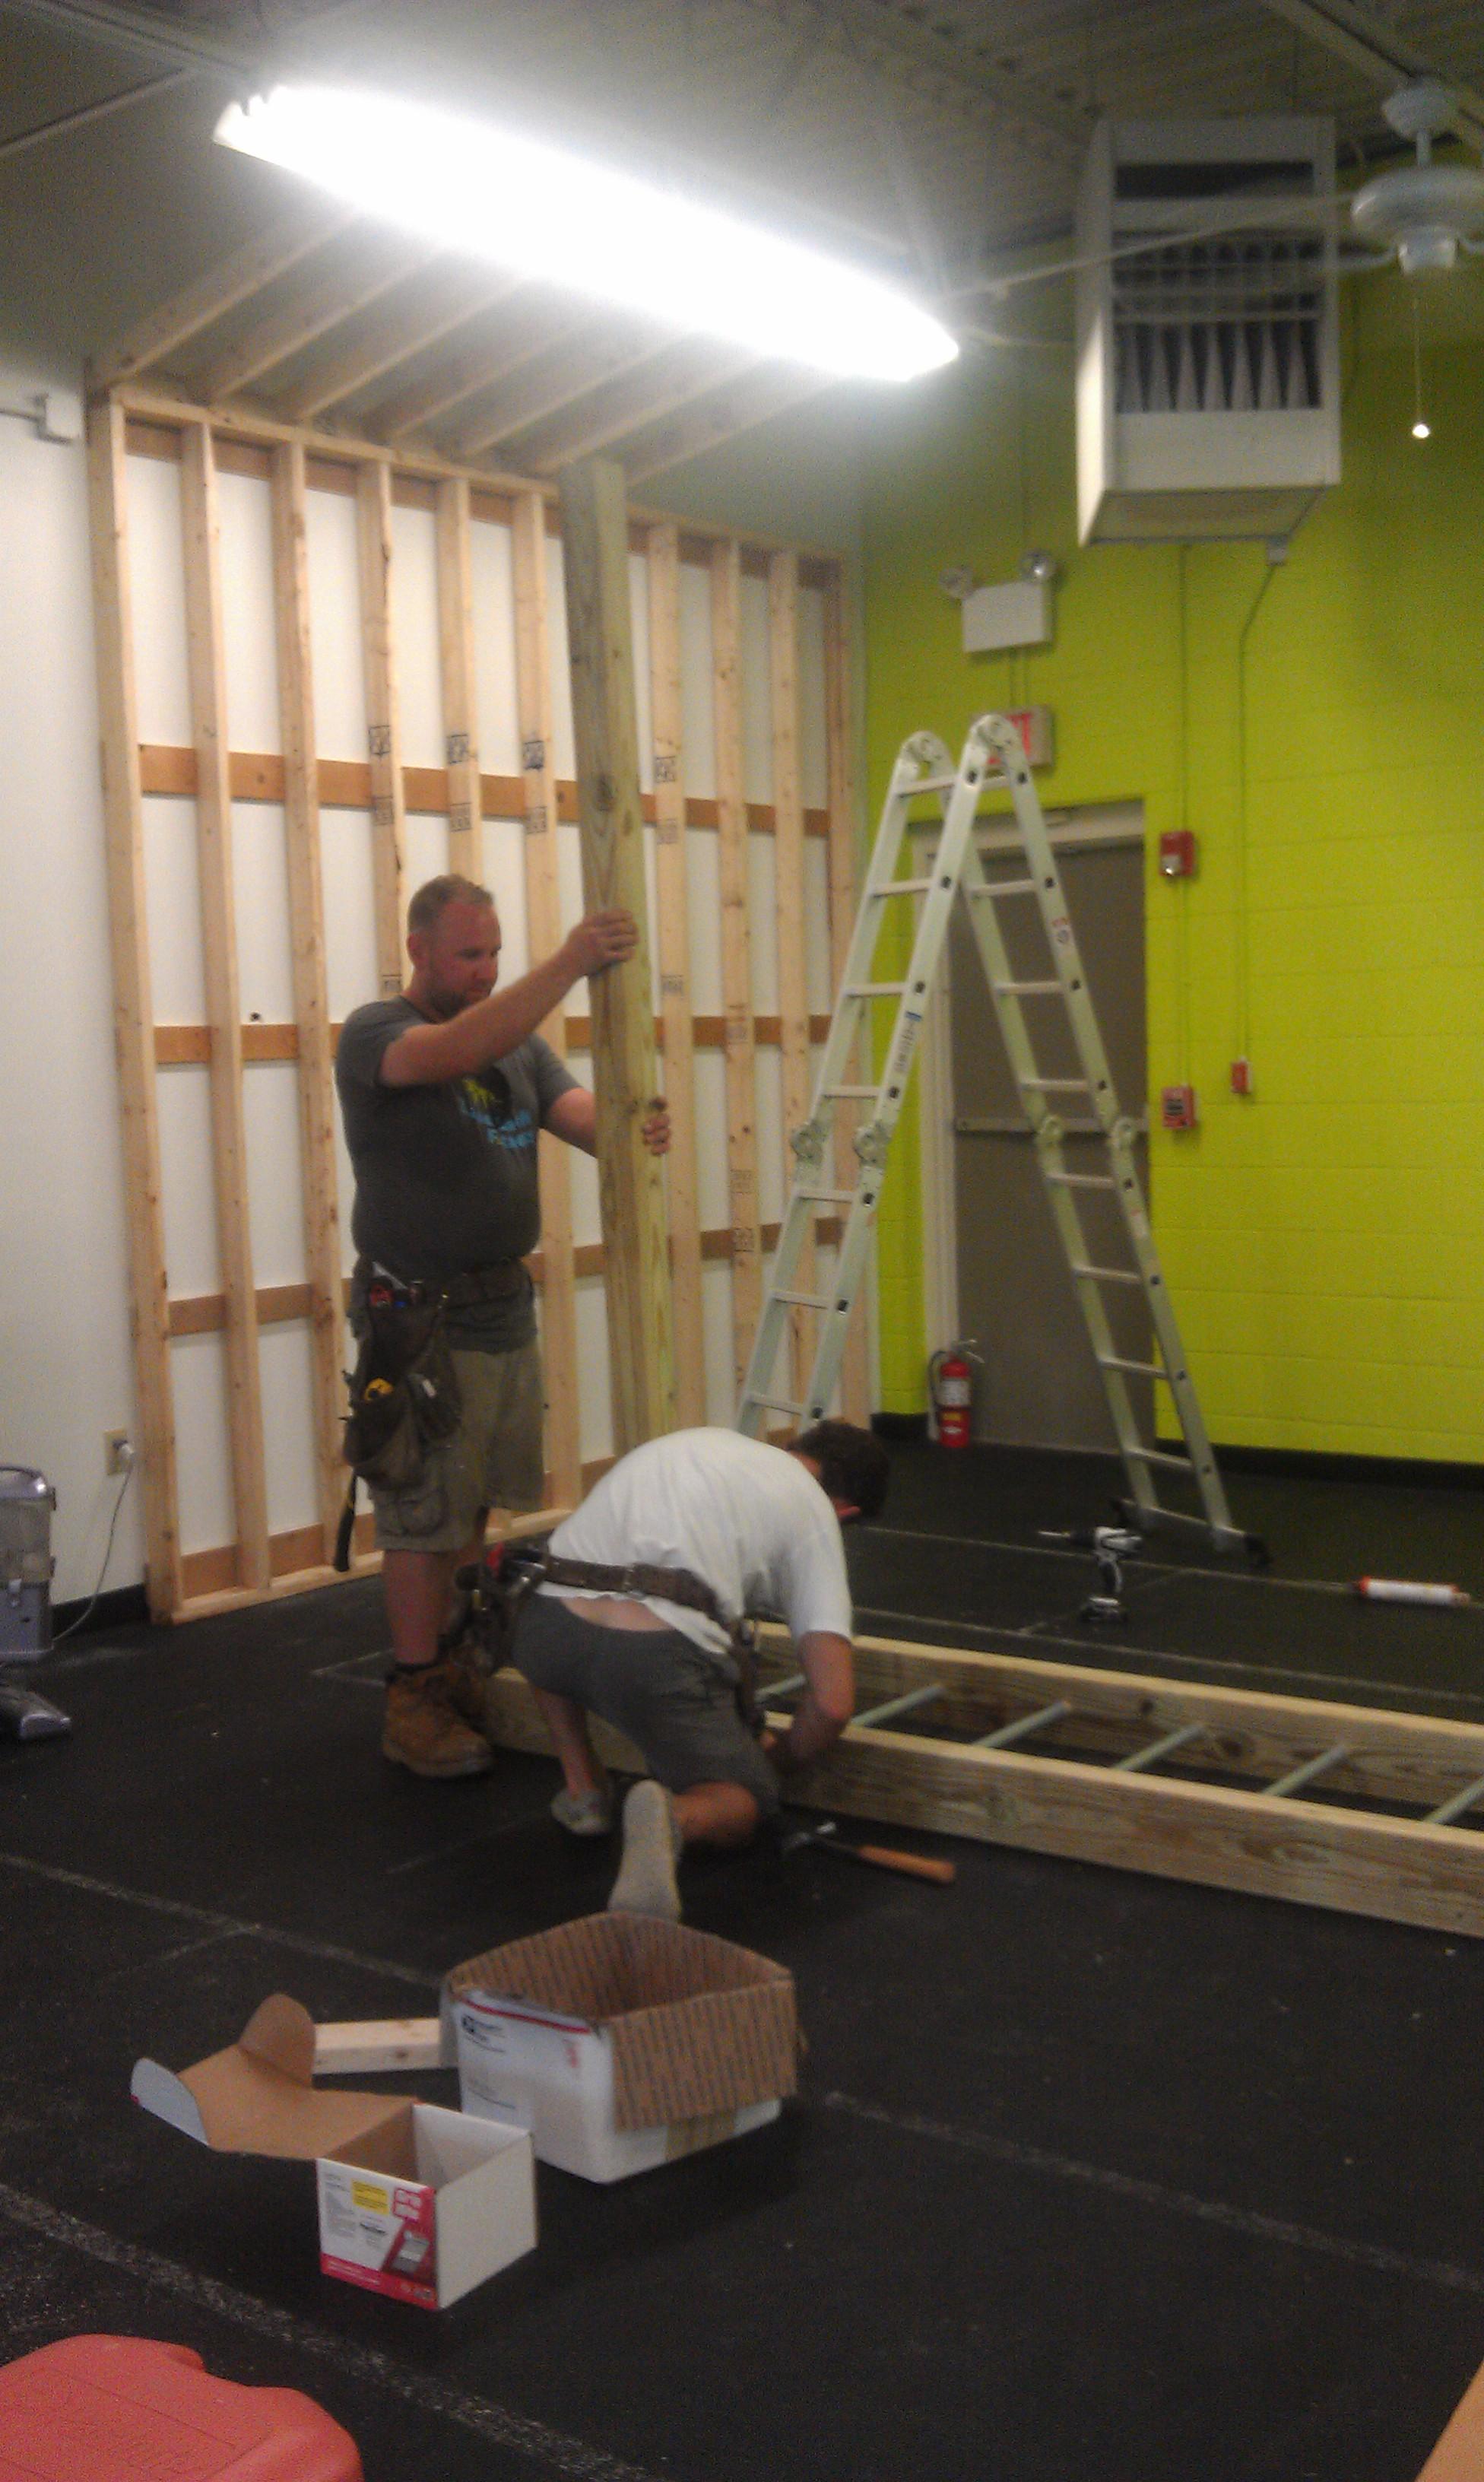 Building The New LbF - Build monkey bars ladder